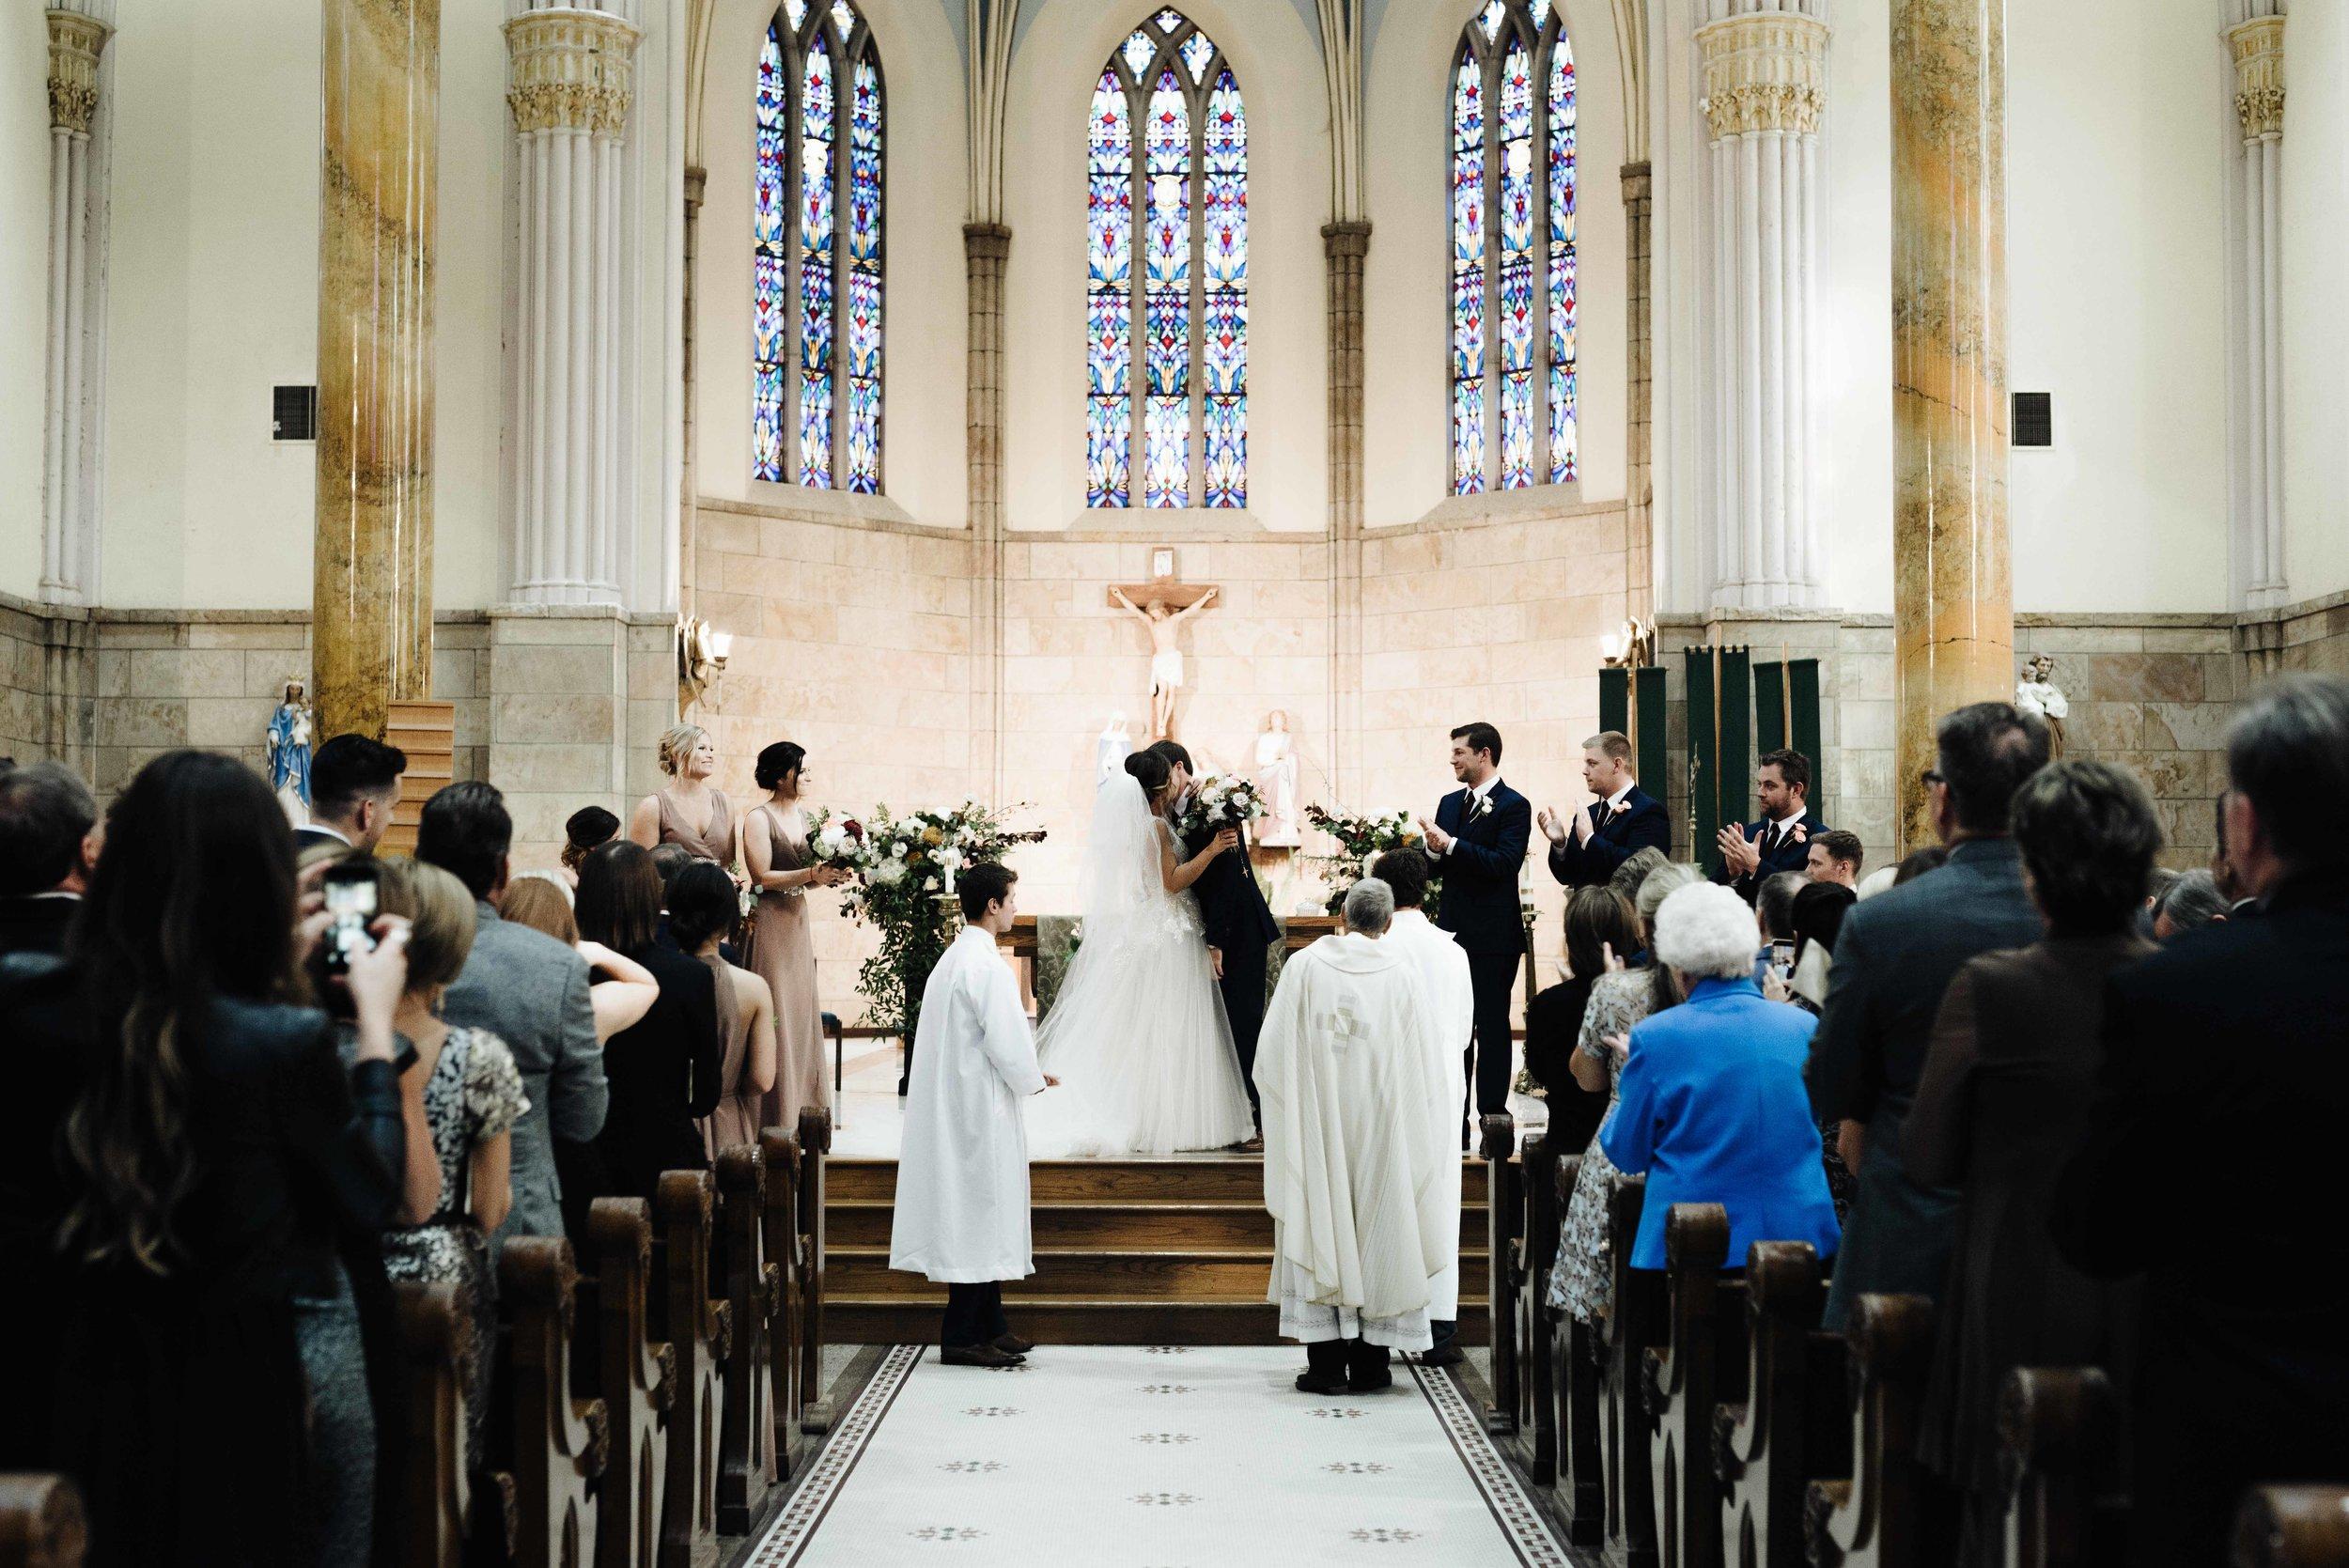 Carlee-Bob-Indianapolis-Wedding-Blog-58.jpg